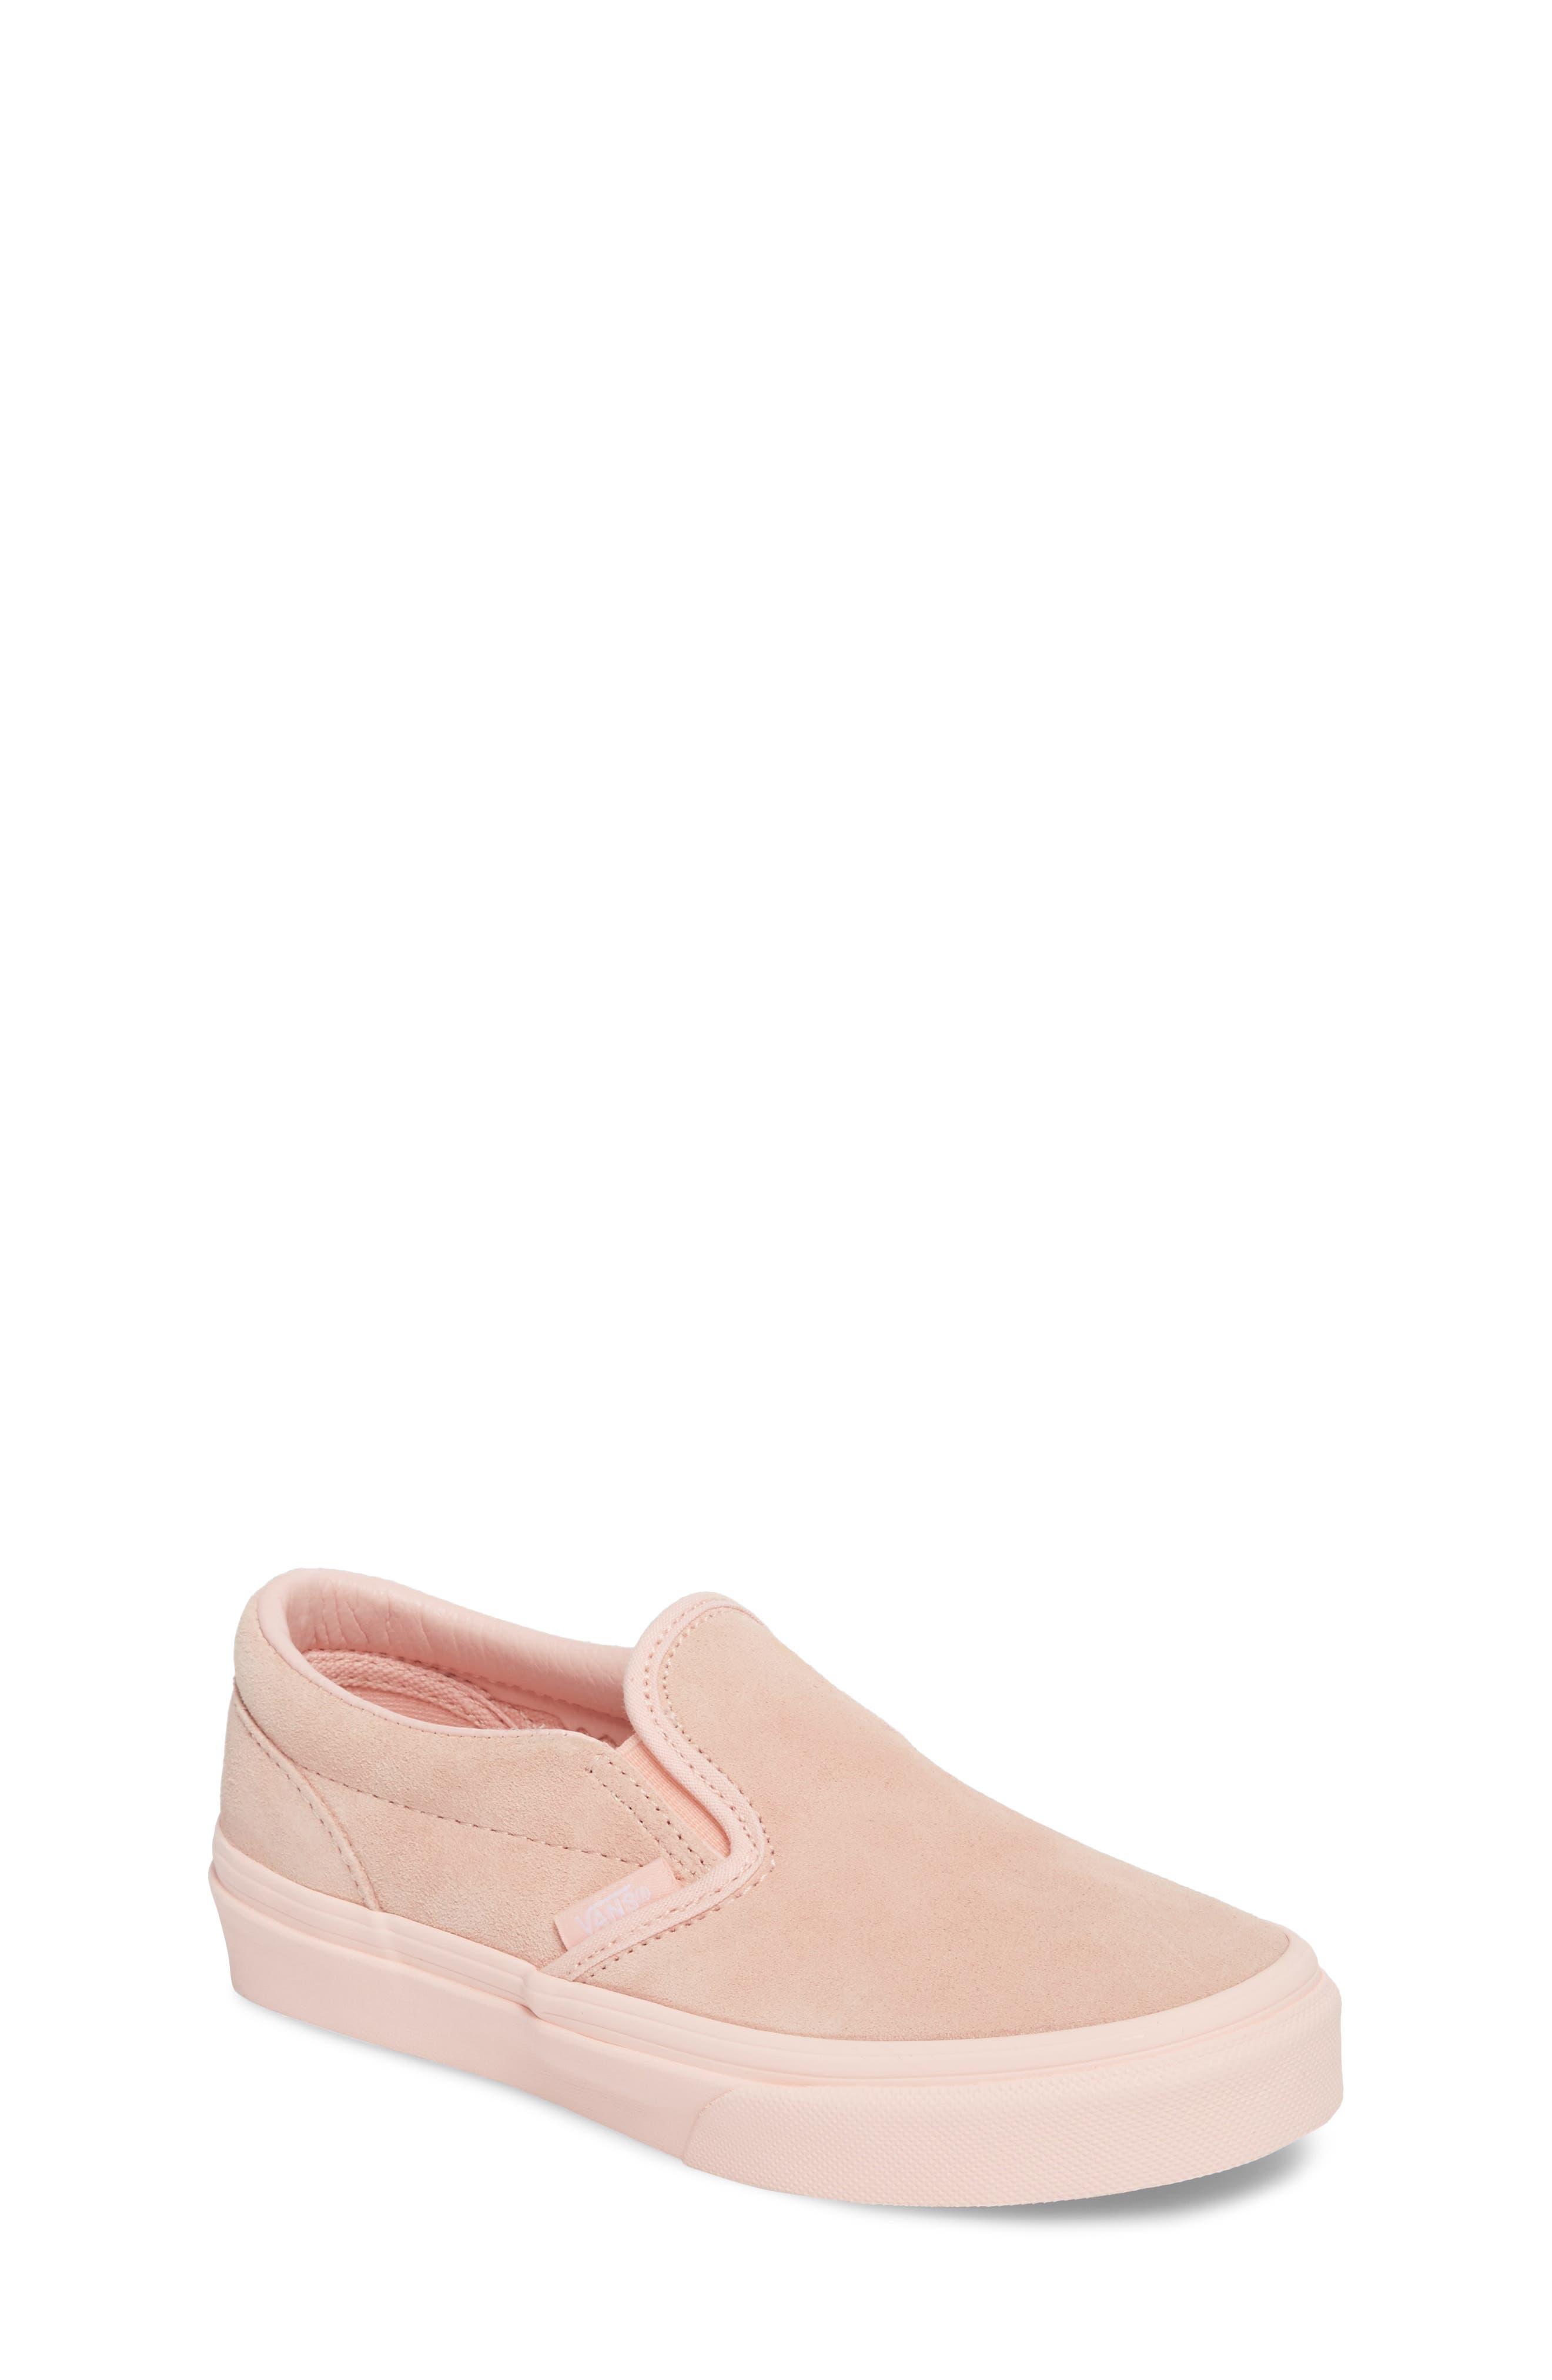 Classic Slip-On Sneaker,                             Main thumbnail 1, color,                             670